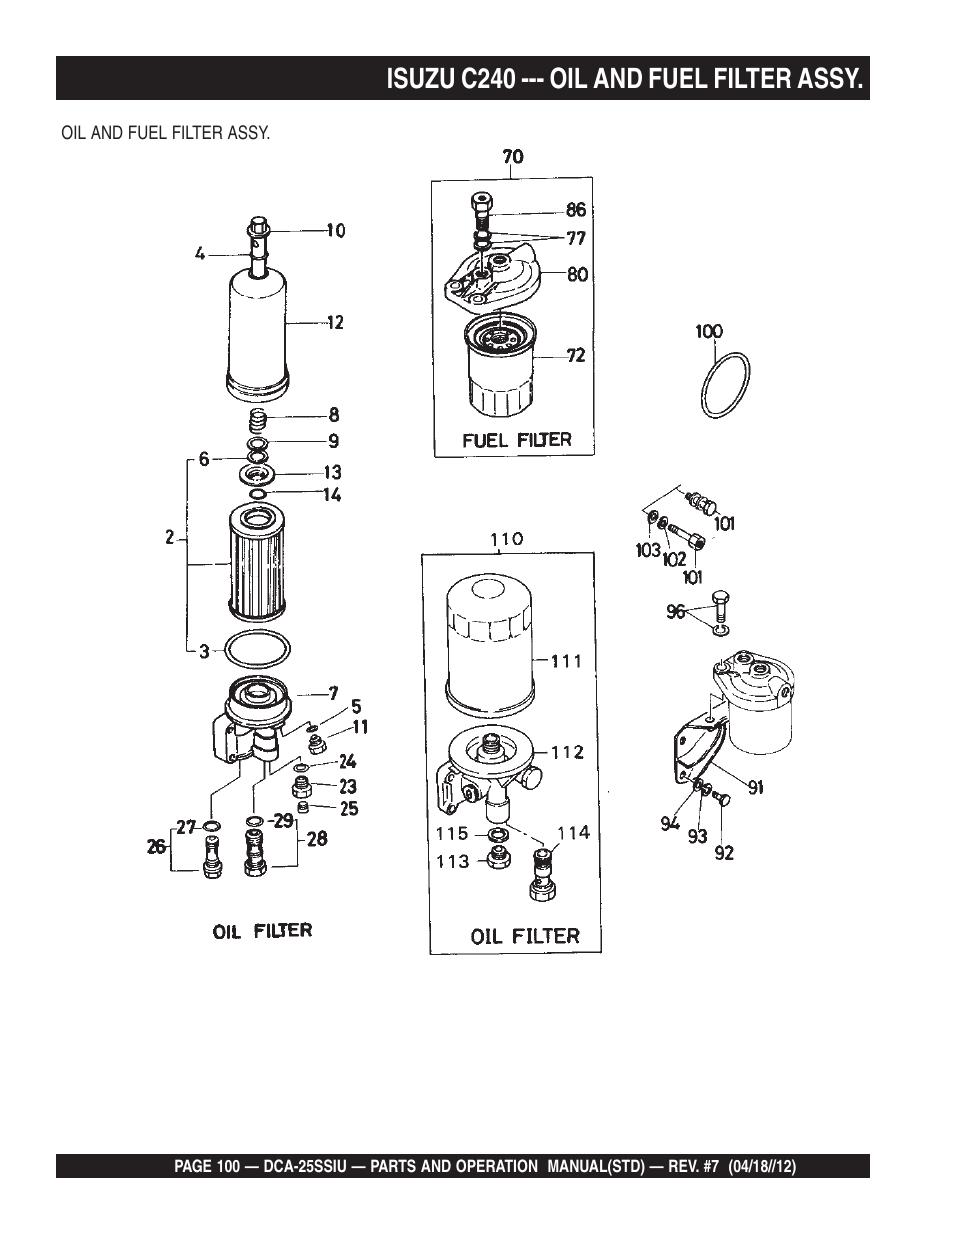 hight resolution of isuzu c240 oil and fuel filter assy multiquip wisperwatt generator dca25ssiu user manual page 100 142